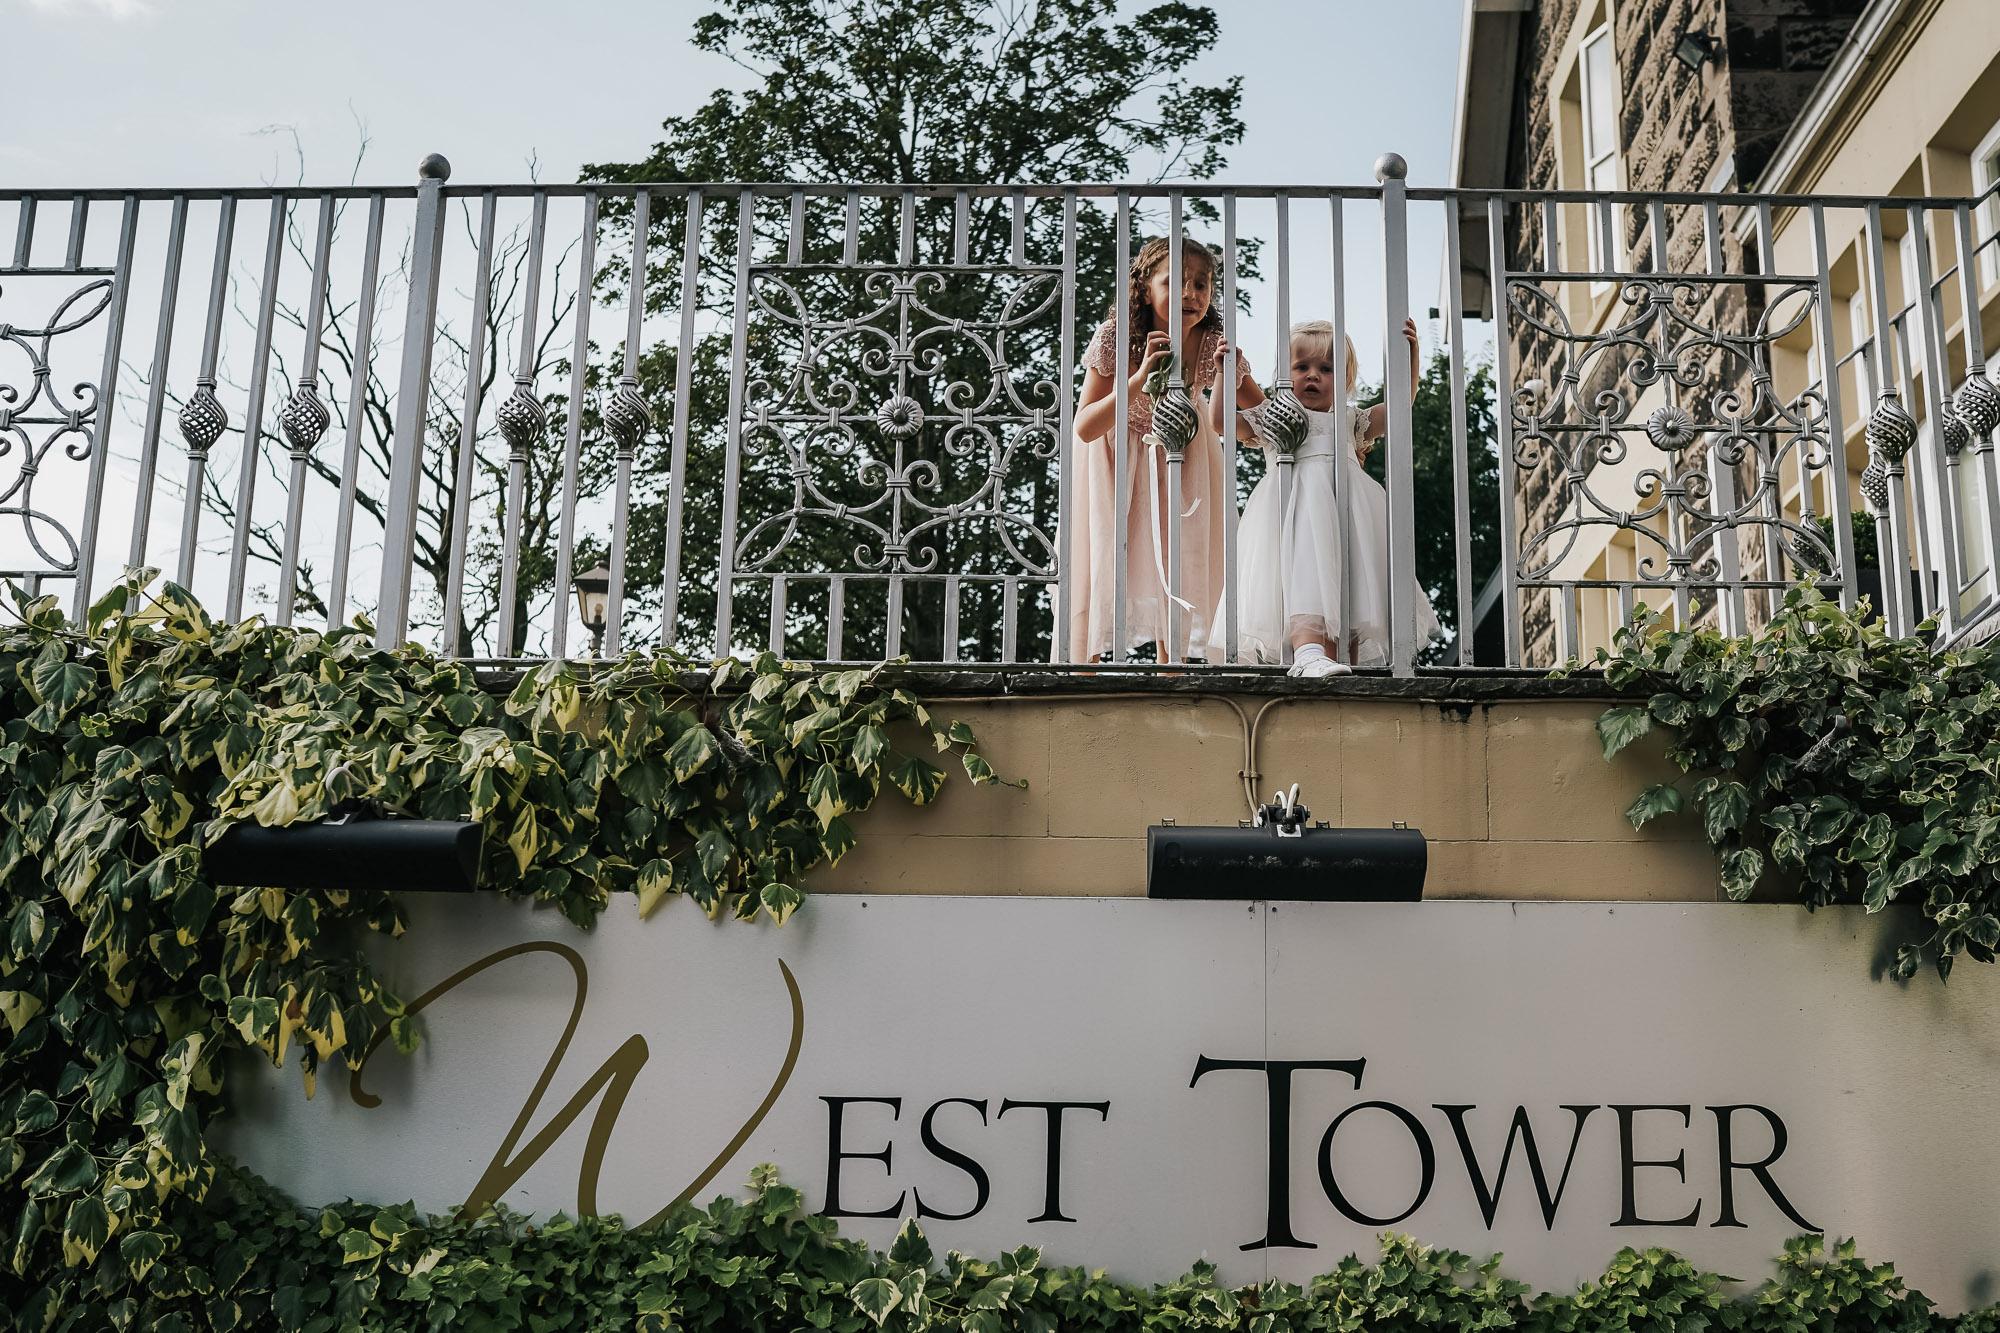 West Tower Wedding Photographer Ormskirk Lancashire wedding photography (29 of 57).jpg